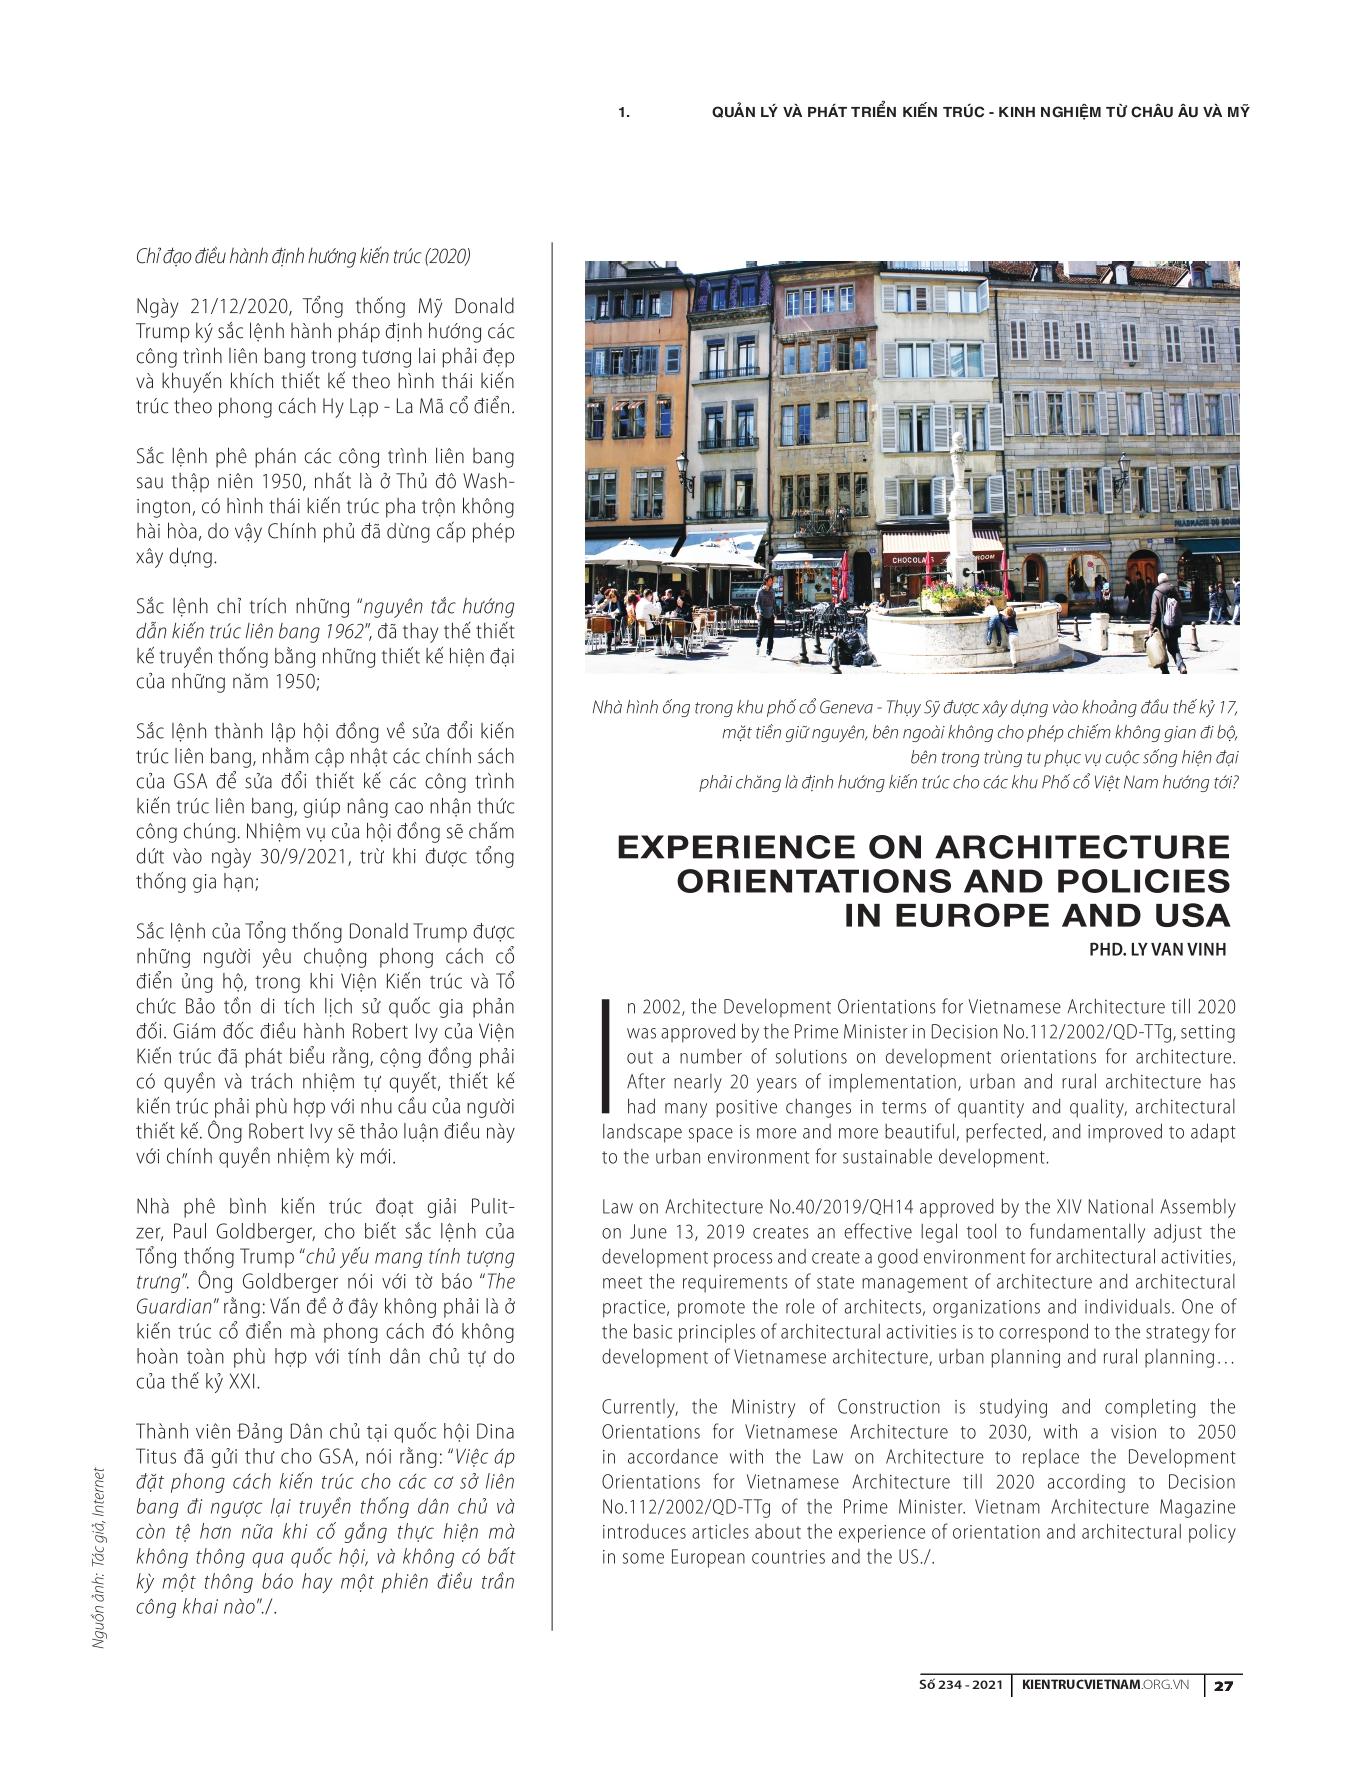 TCKTVN 234 P1_page-0027